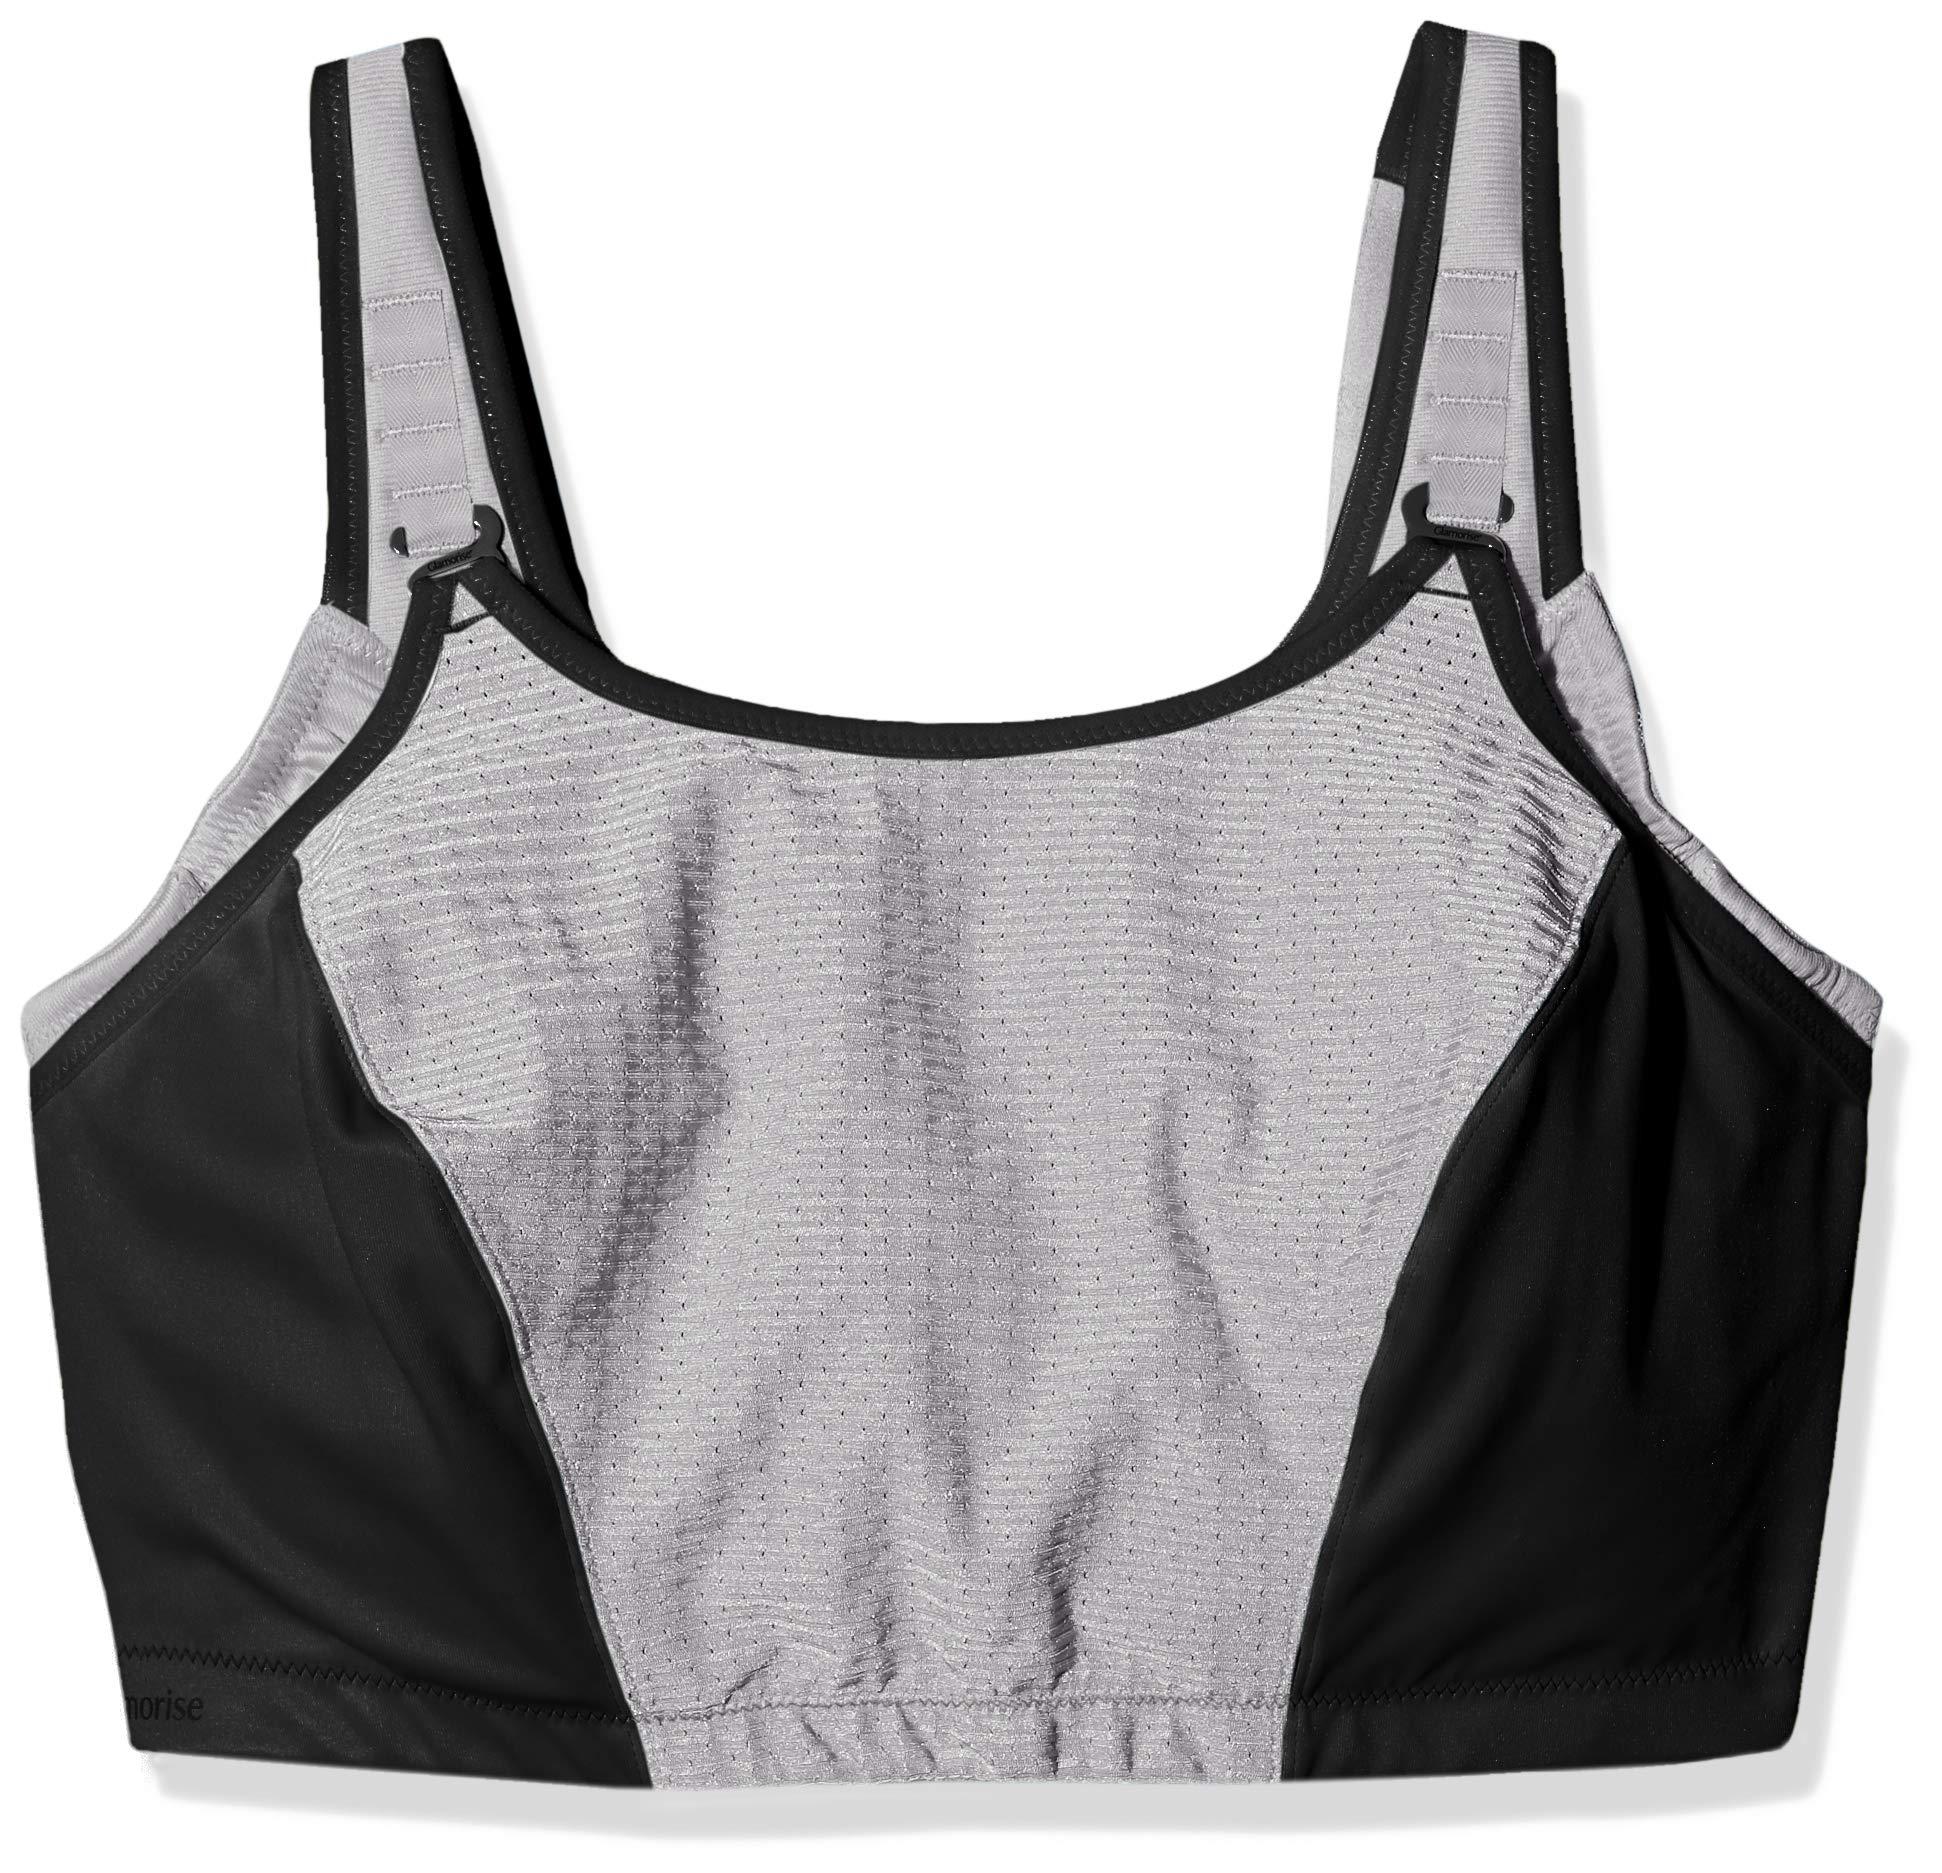 Glamorise Women's Plus Size Full Figure Adjustable Wirefree Sport Bra #1196, BLK, 38I by Glamorise